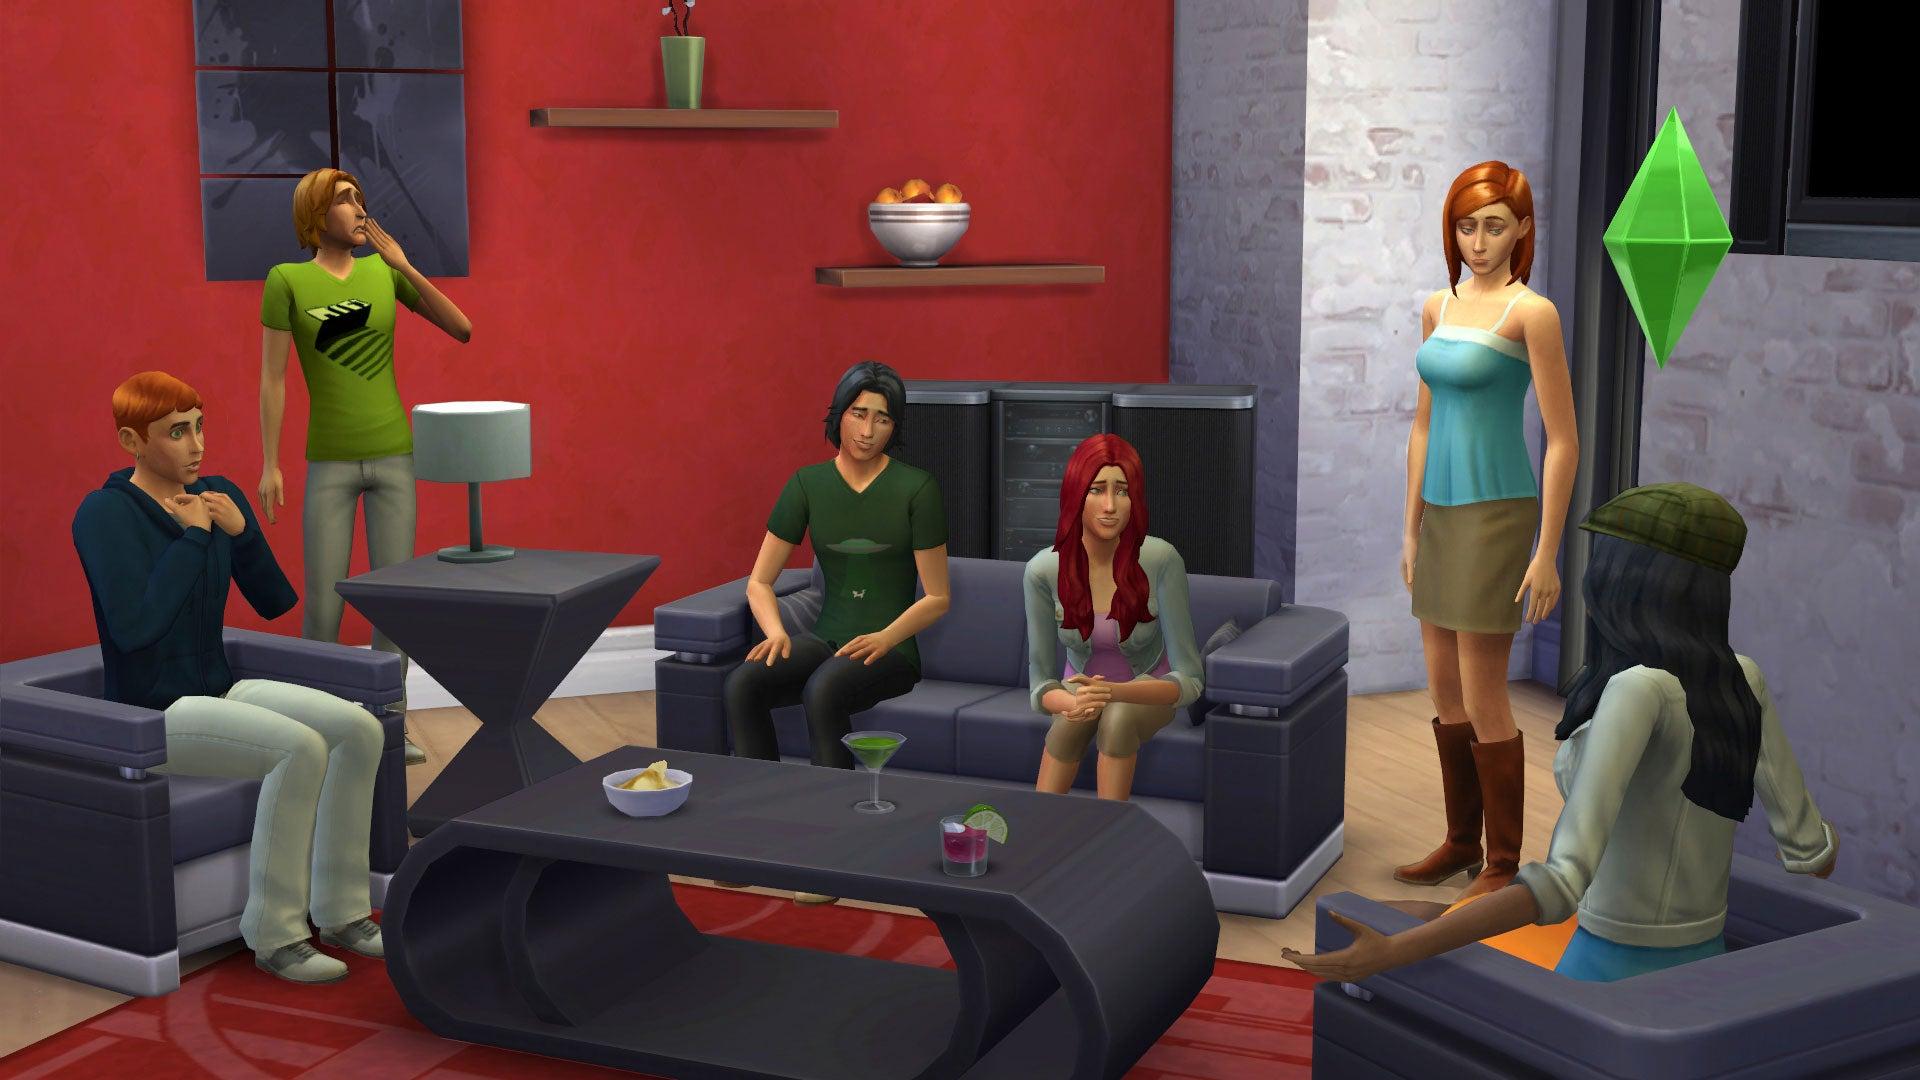 Sims 4 mods add teen pregnancy incest and polygamy kotaku australia